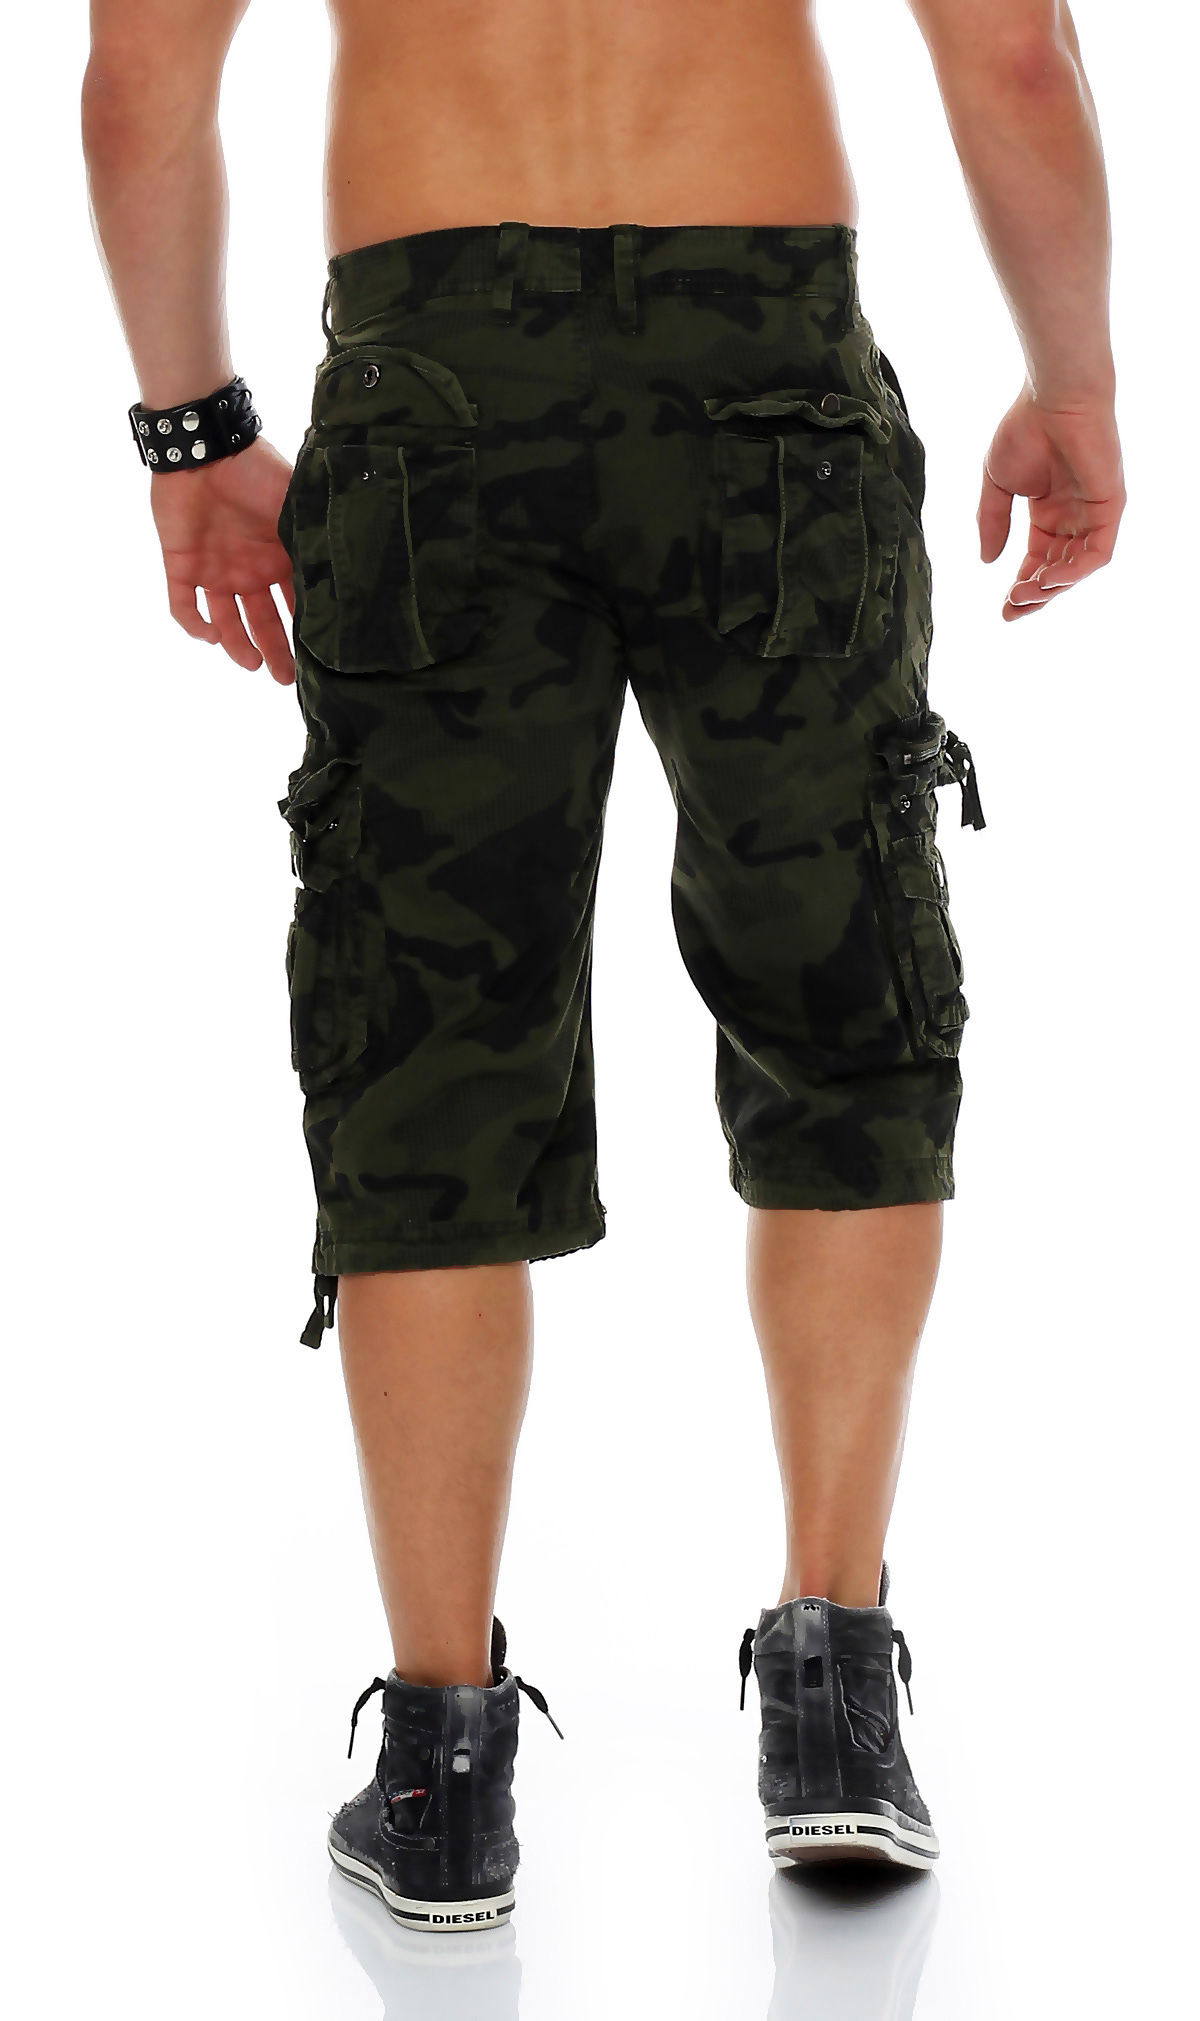 herren shorts kurze capri hose sommer bermuda casual army cargo baumwolle 3 4. Black Bedroom Furniture Sets. Home Design Ideas